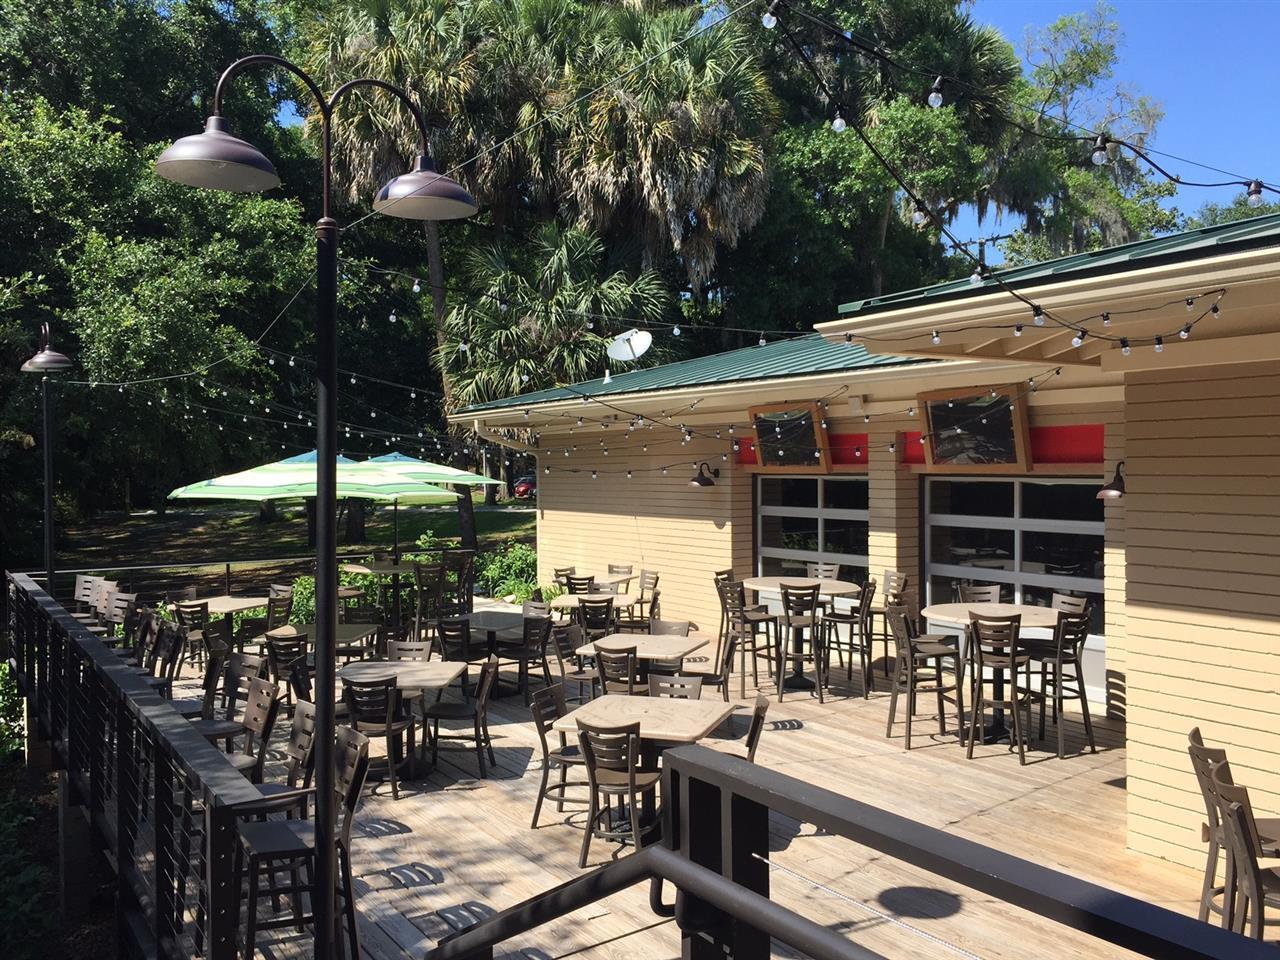 #JacksonvilleFL #JacksonvilleUniversity #RathskellerCafe